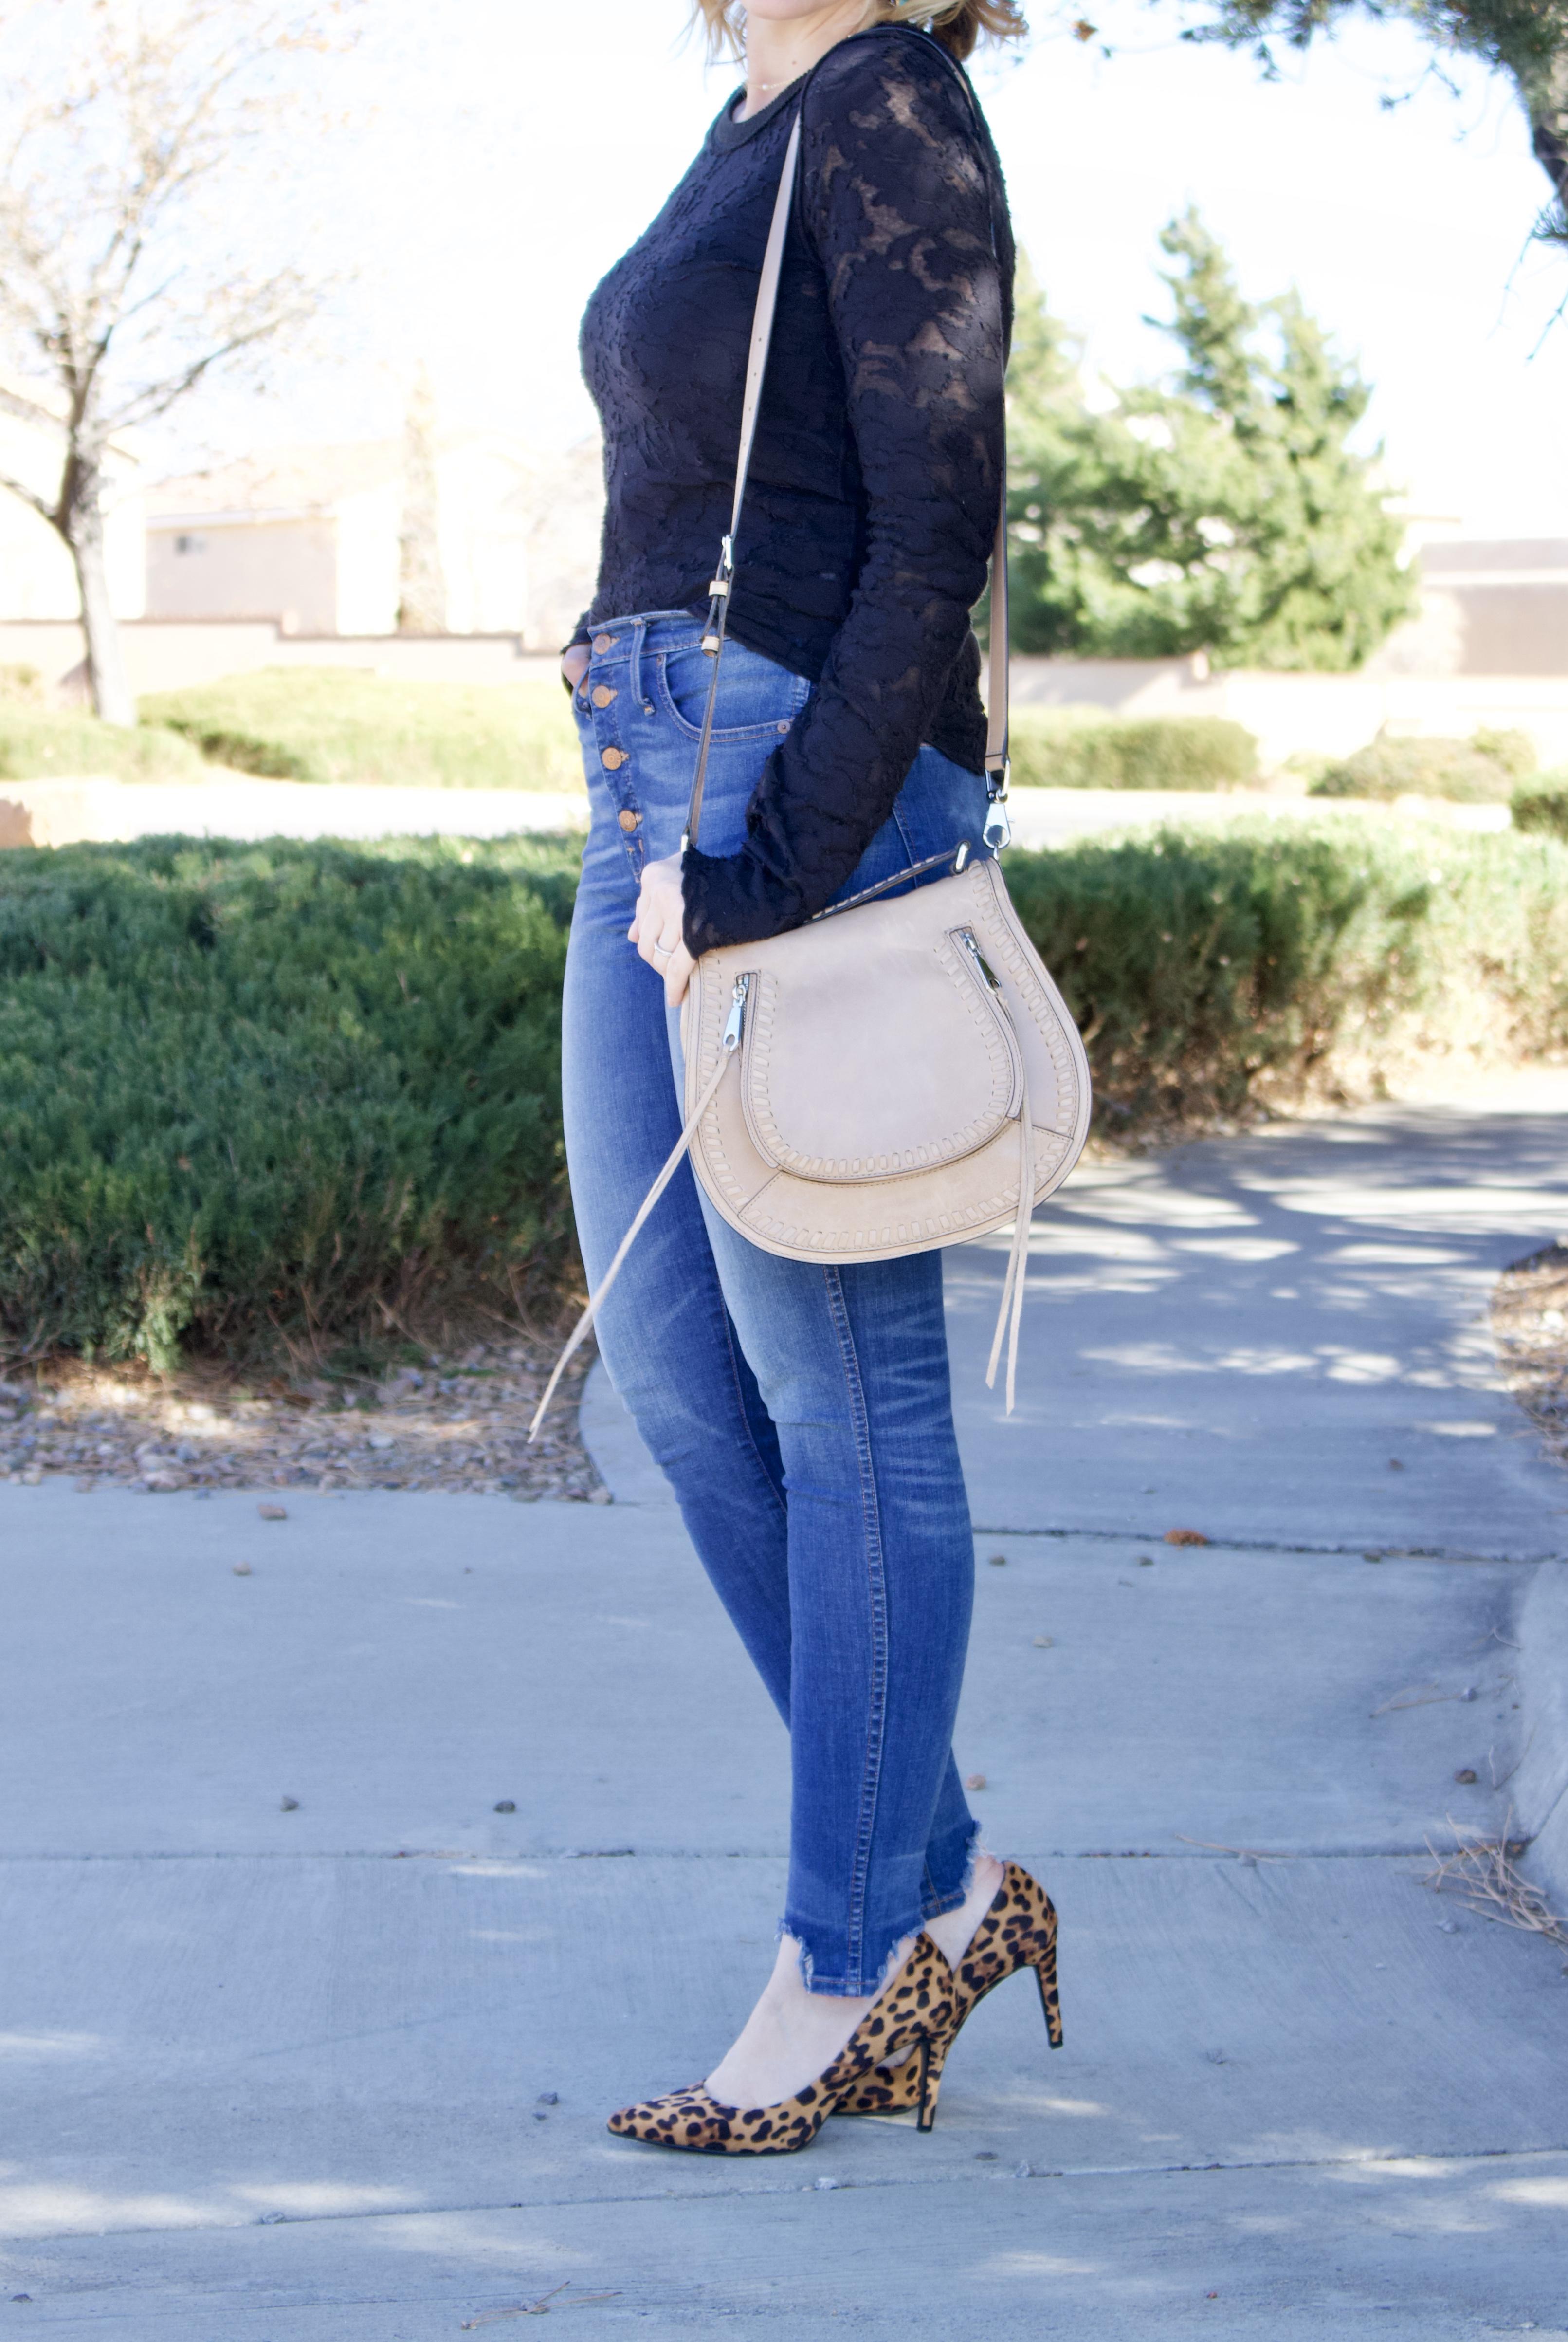 rebecca minkoff vanity saddlebag #rebeccaminkoff #leopardheels #curvyfashion